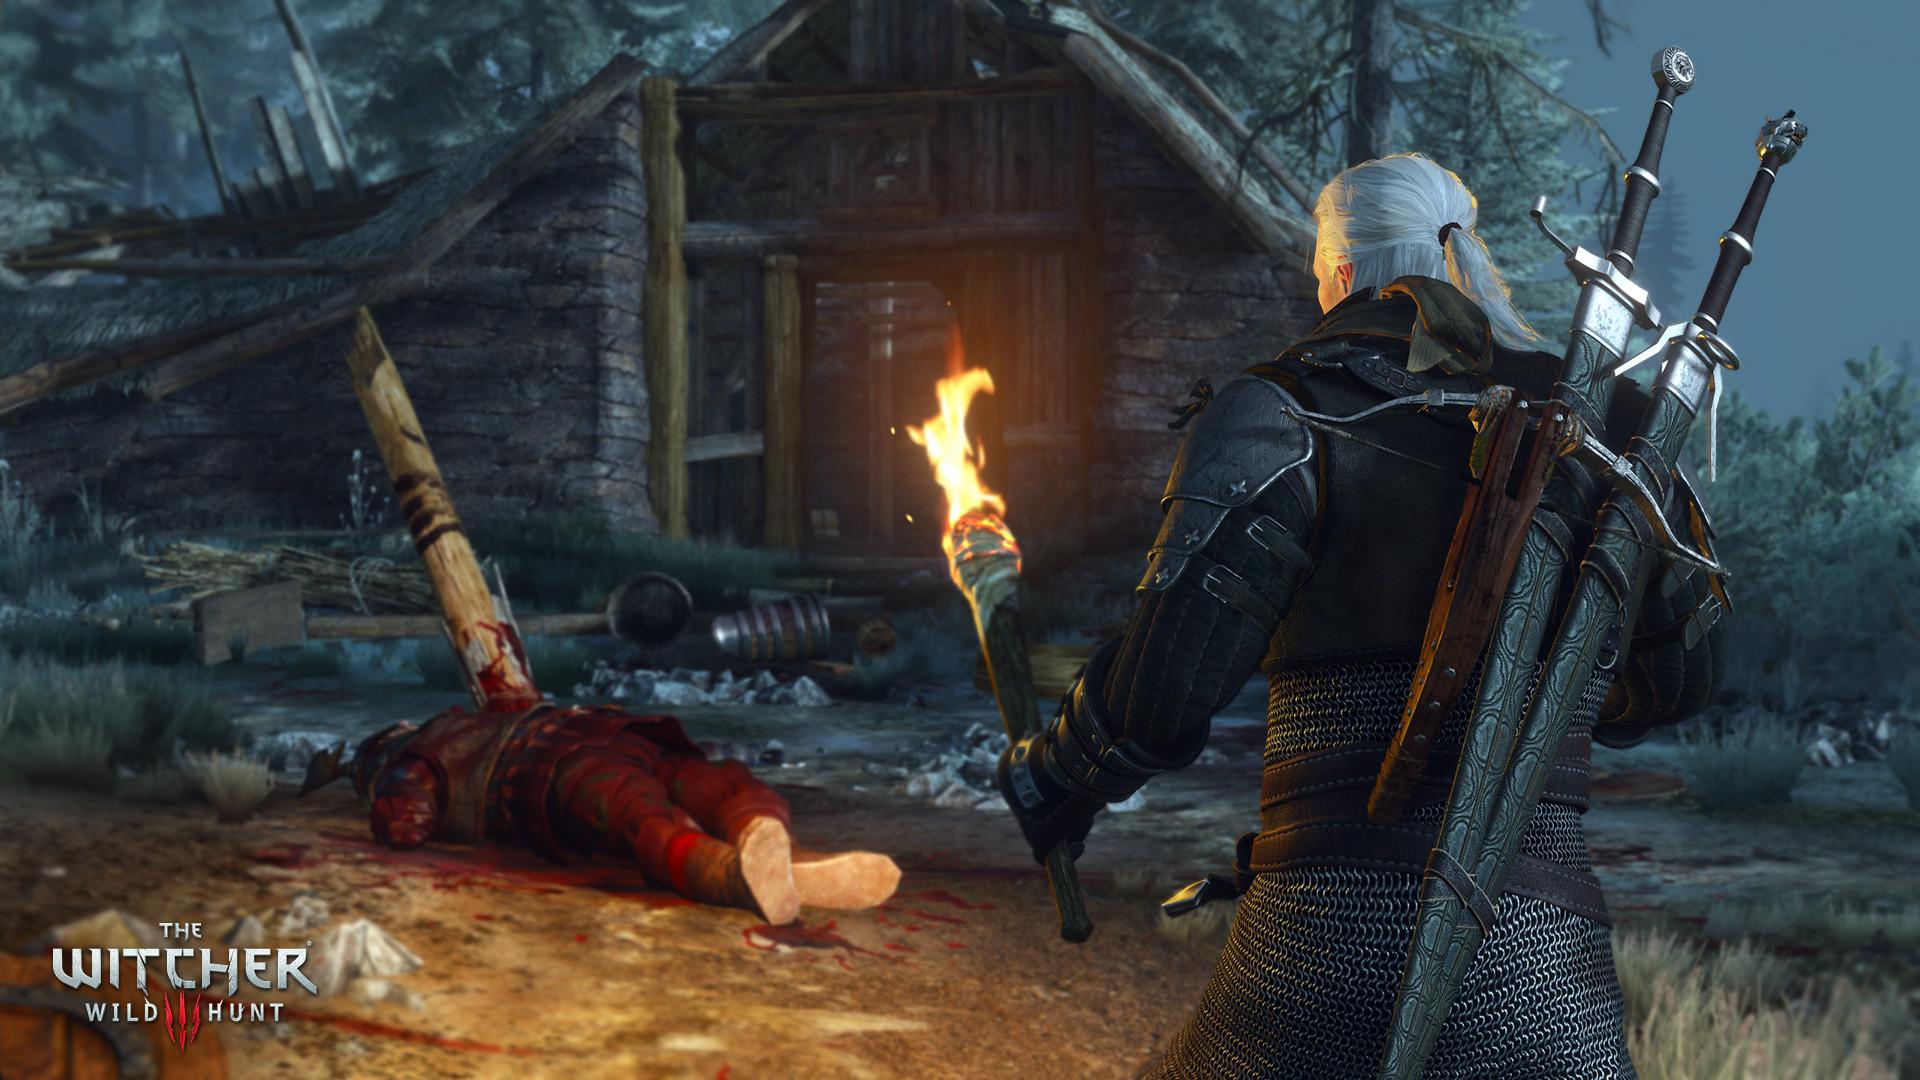 Купить The Witcher 3: Wild Hunt [GOG]+ подарок + бонус